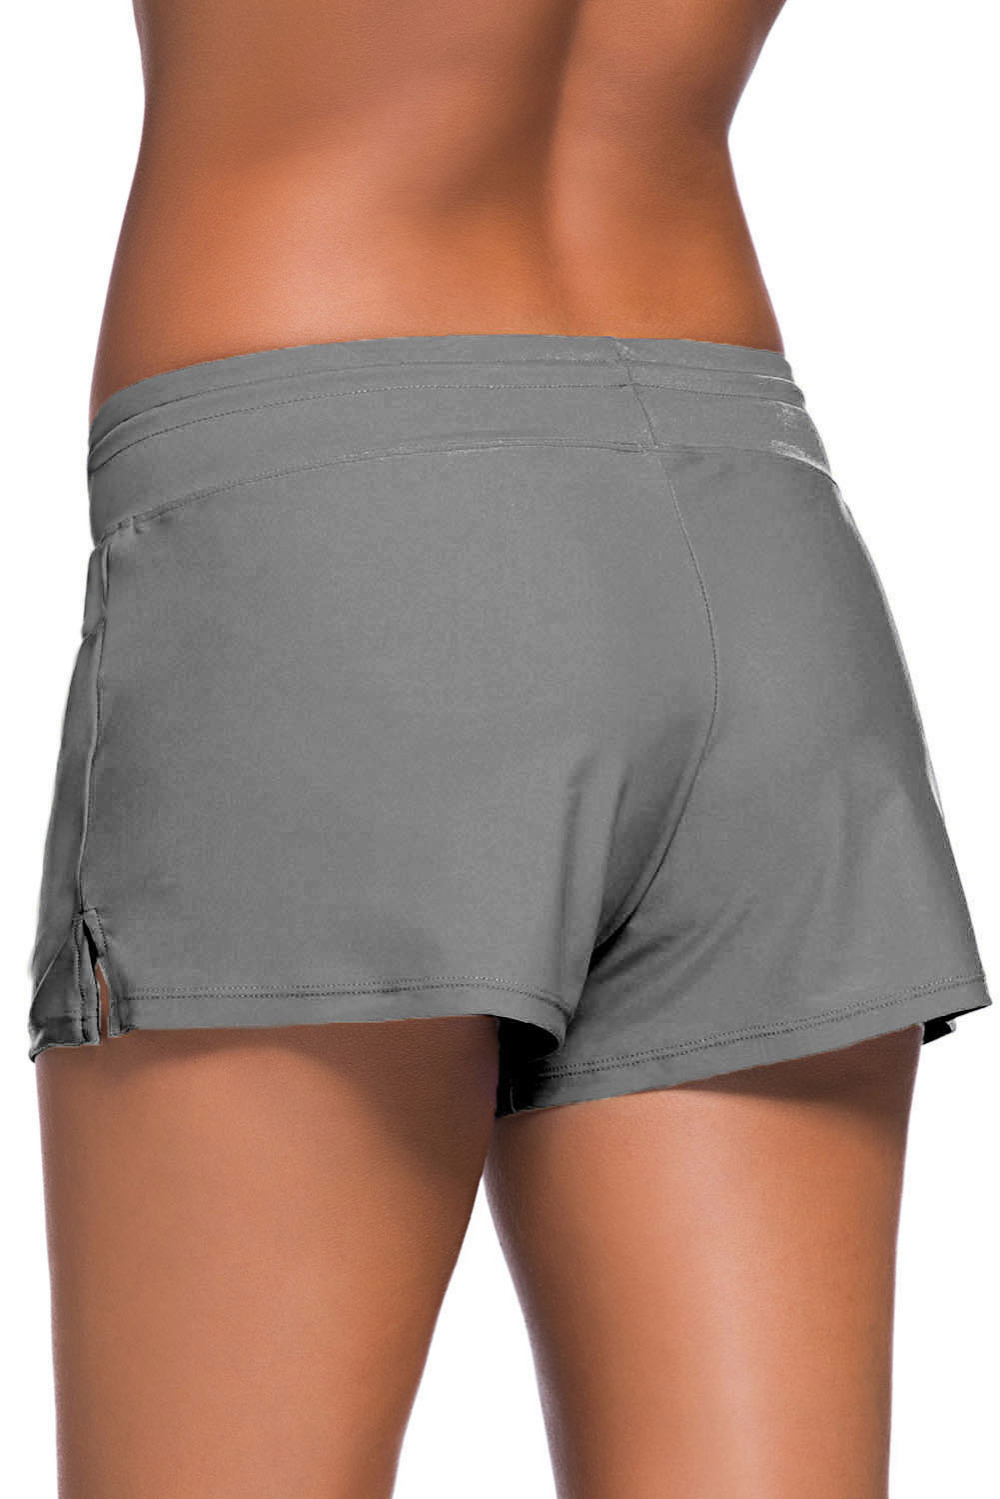 Grey-Women-Swim-Boardshort-LC41977-11-4